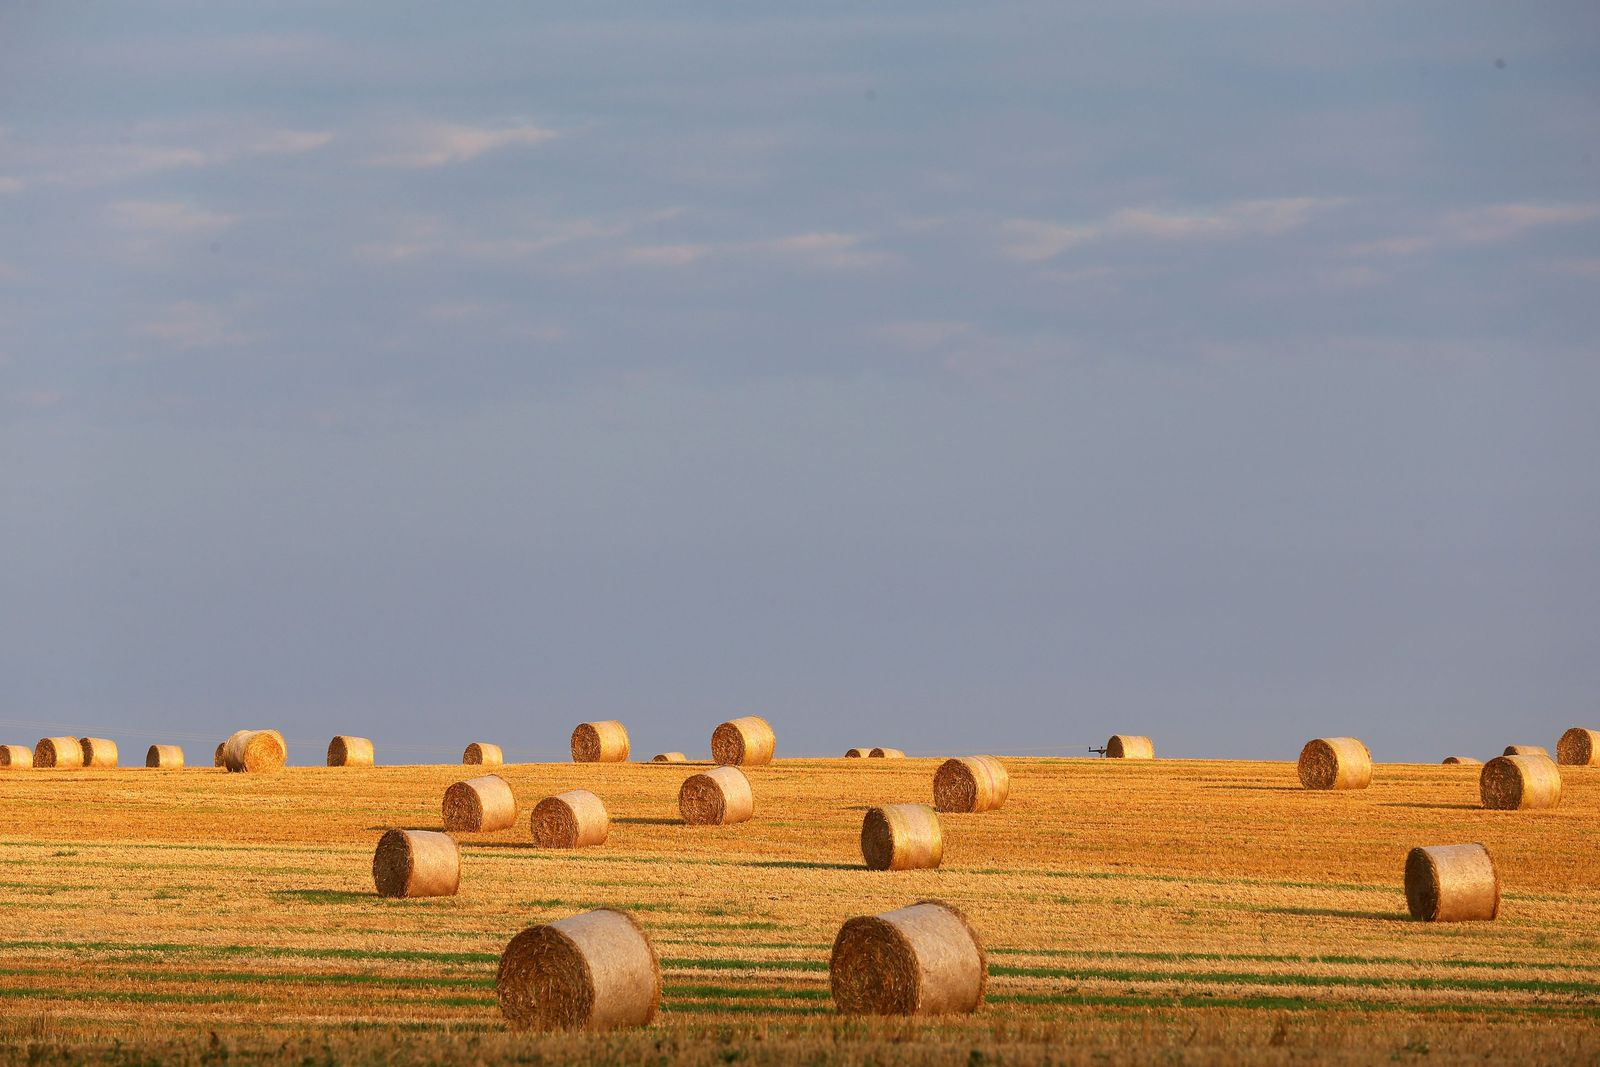 Getreide / Weizen-Feld / Lebensmittel